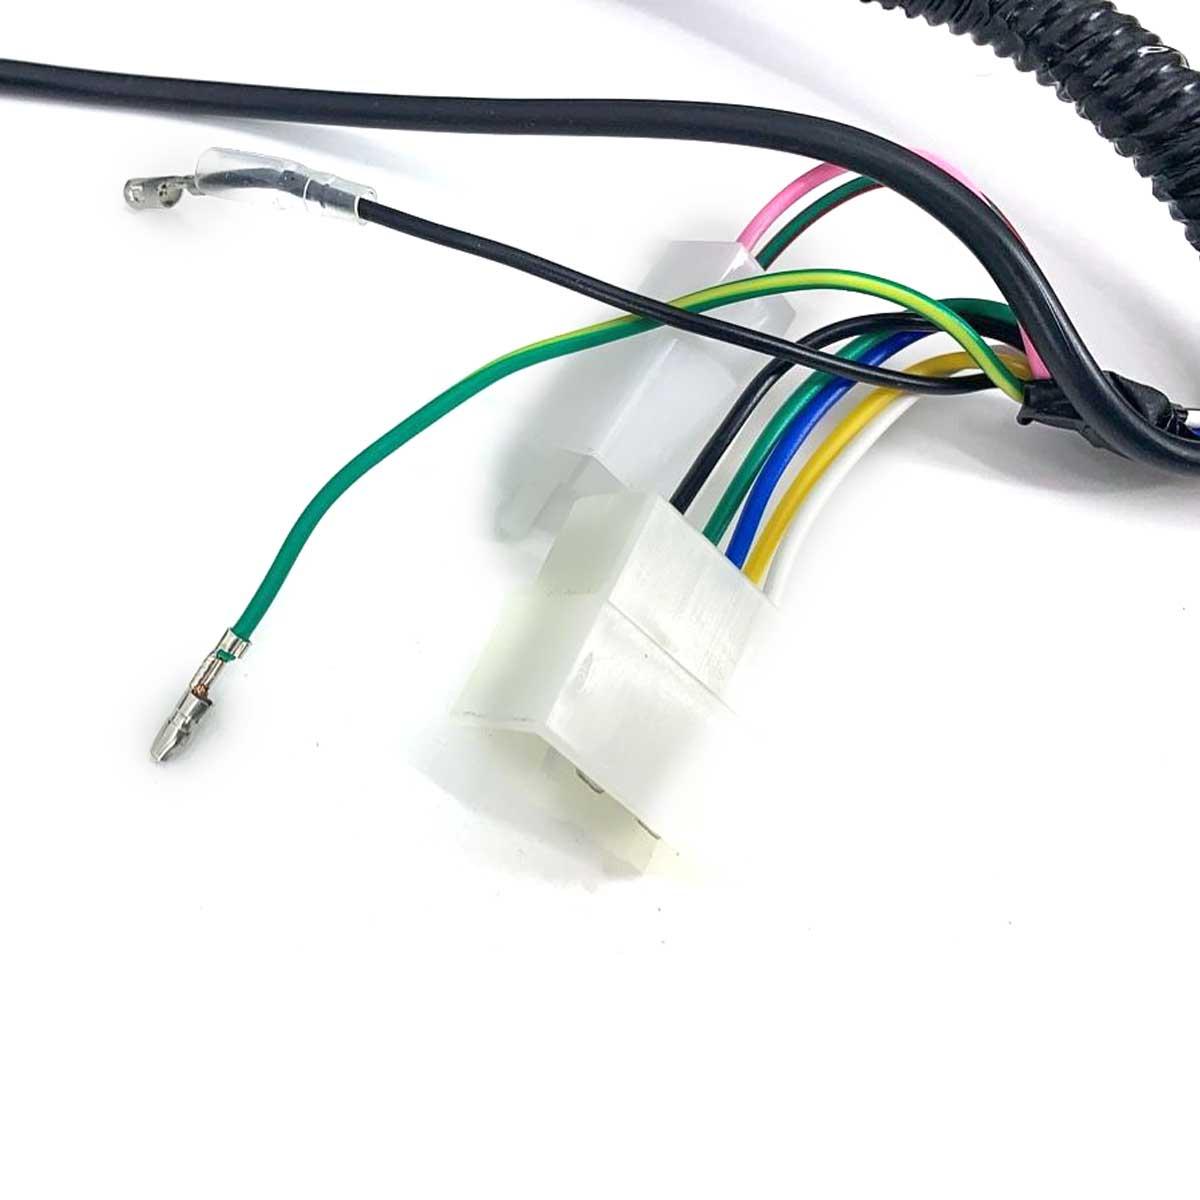 Full Electrics Stator Wiring Harness Loom Set For 150cc